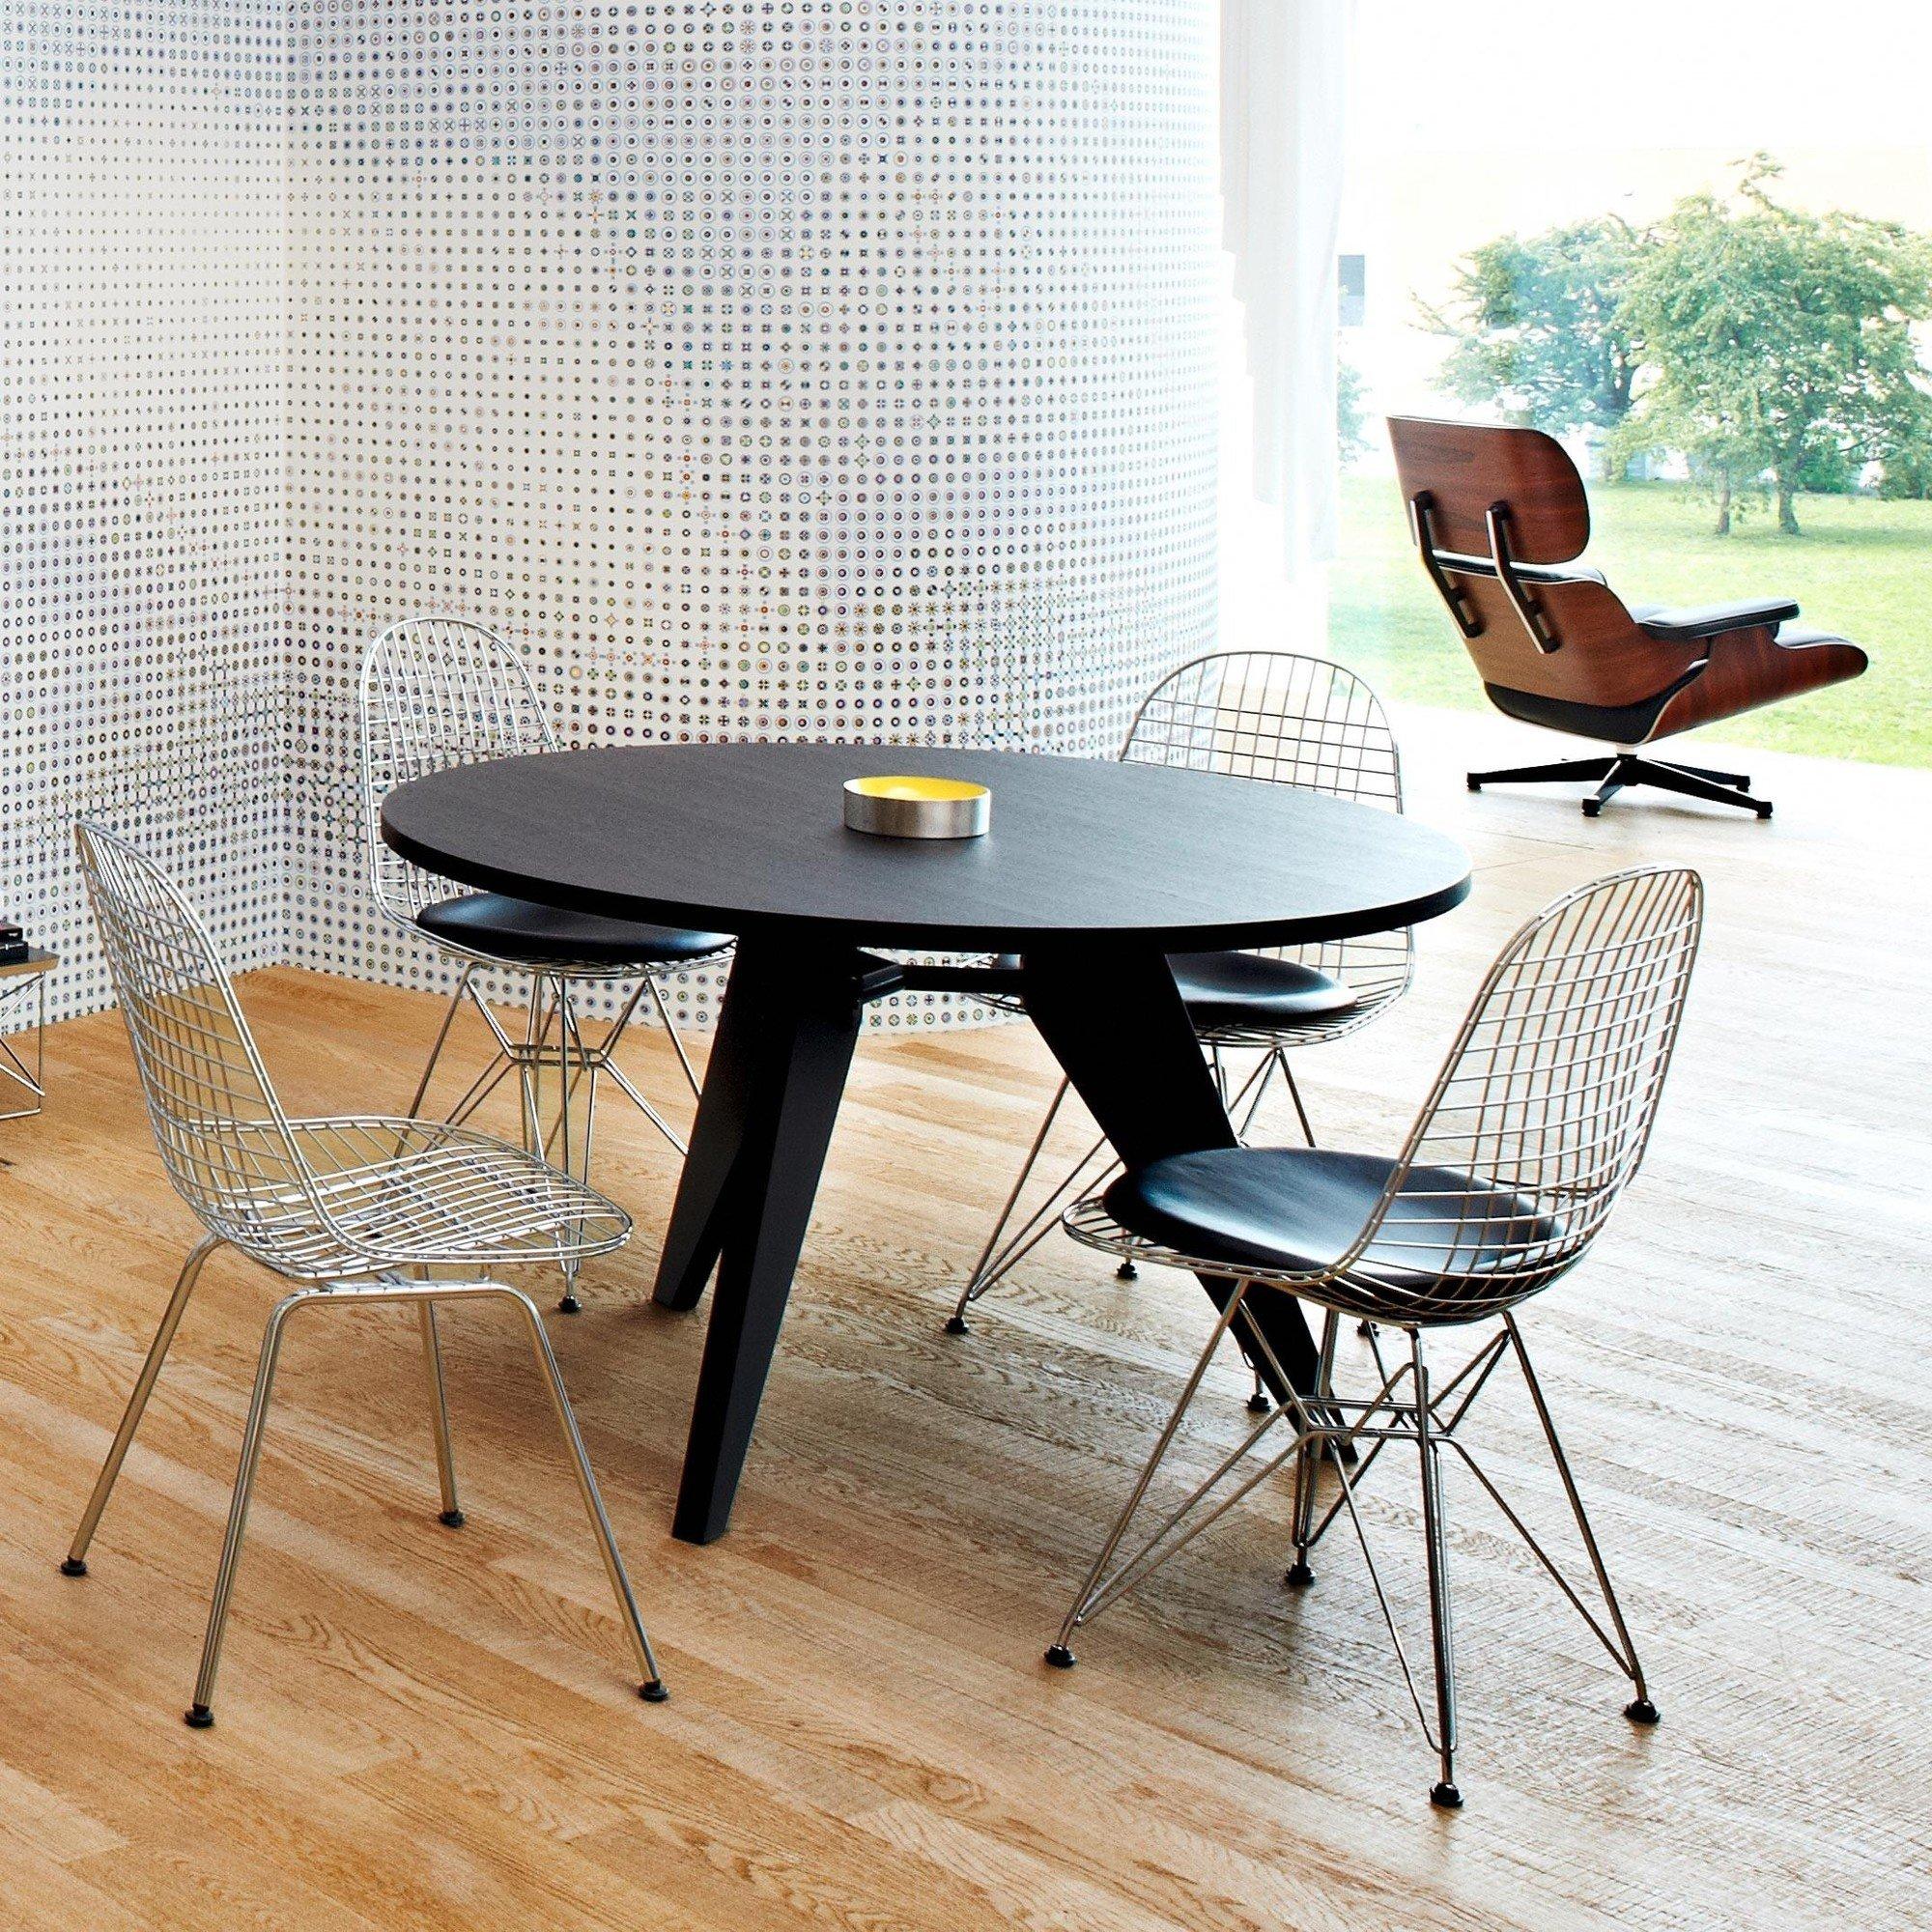 eames lounge chair vitra. Black Bedroom Furniture Sets. Home Design Ideas